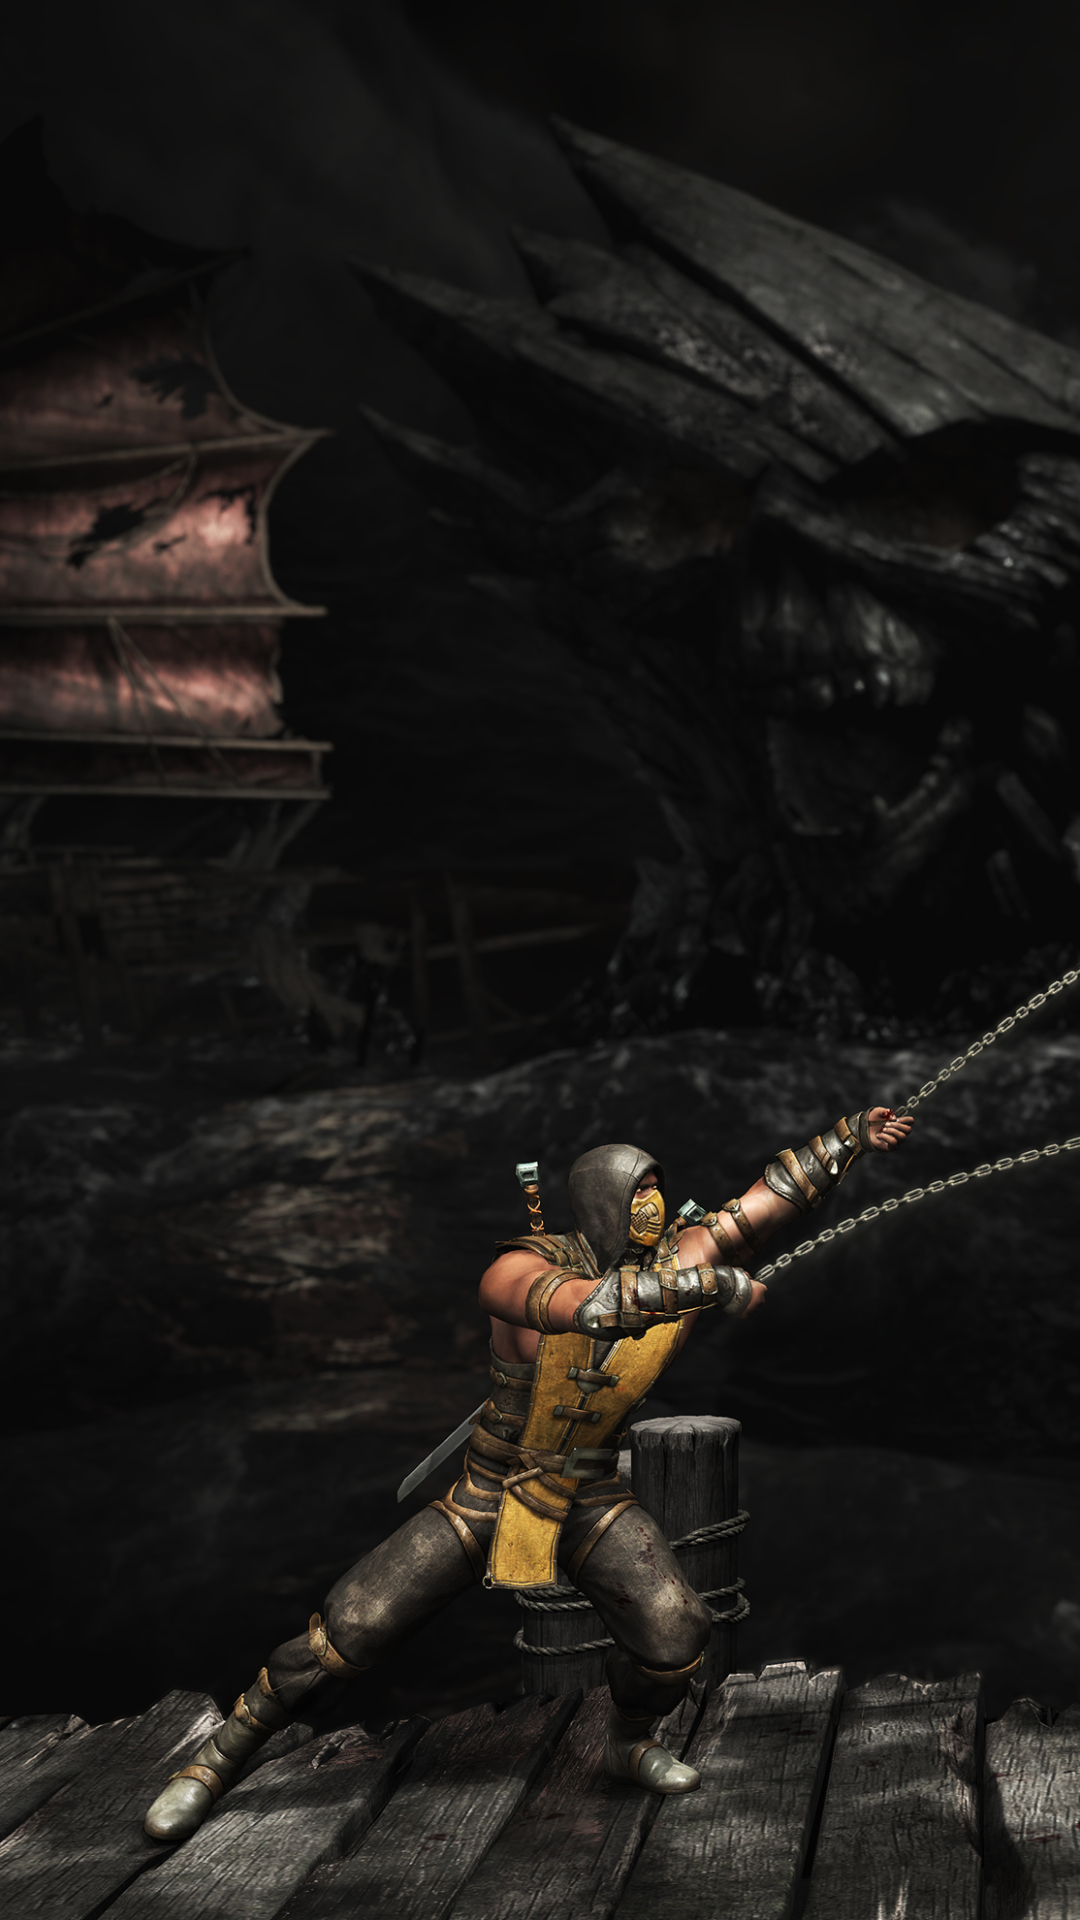 Video Game/Mortal Kombat X (1080x1920) Wallpaper ID: 627944 - Mobile